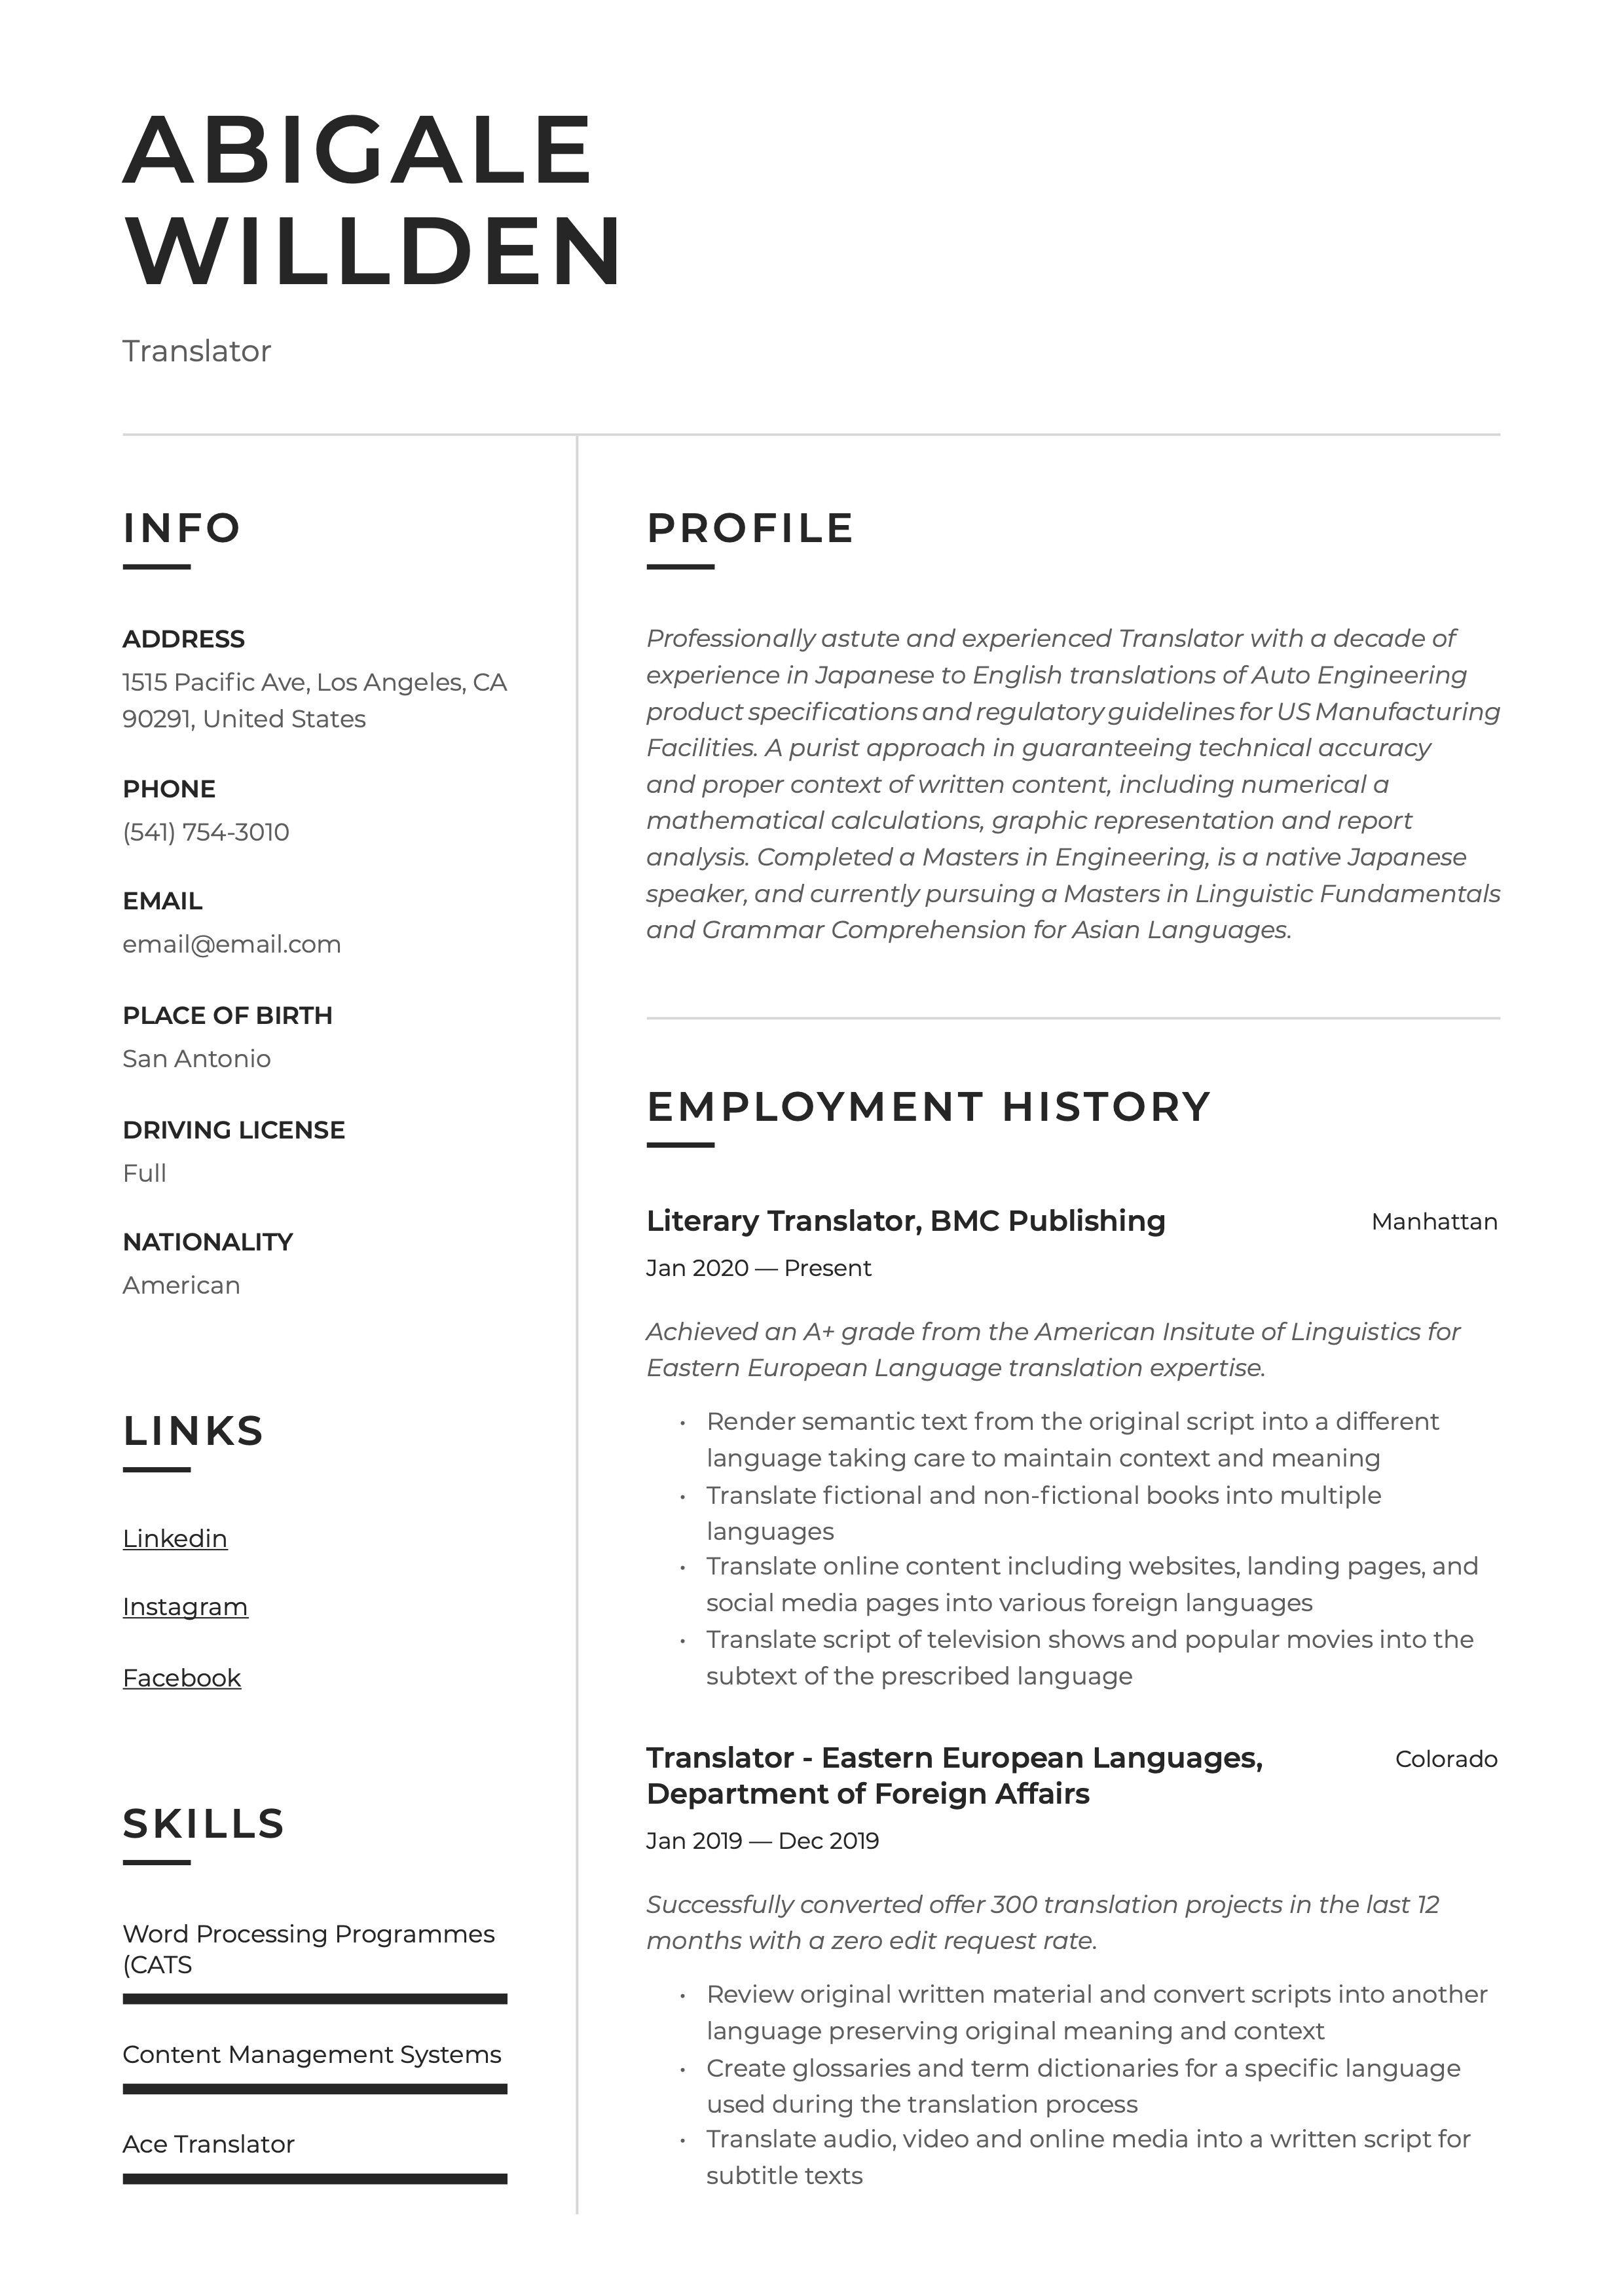 Traslator Resume Example Guided Writing Resume Writing Resume Examples